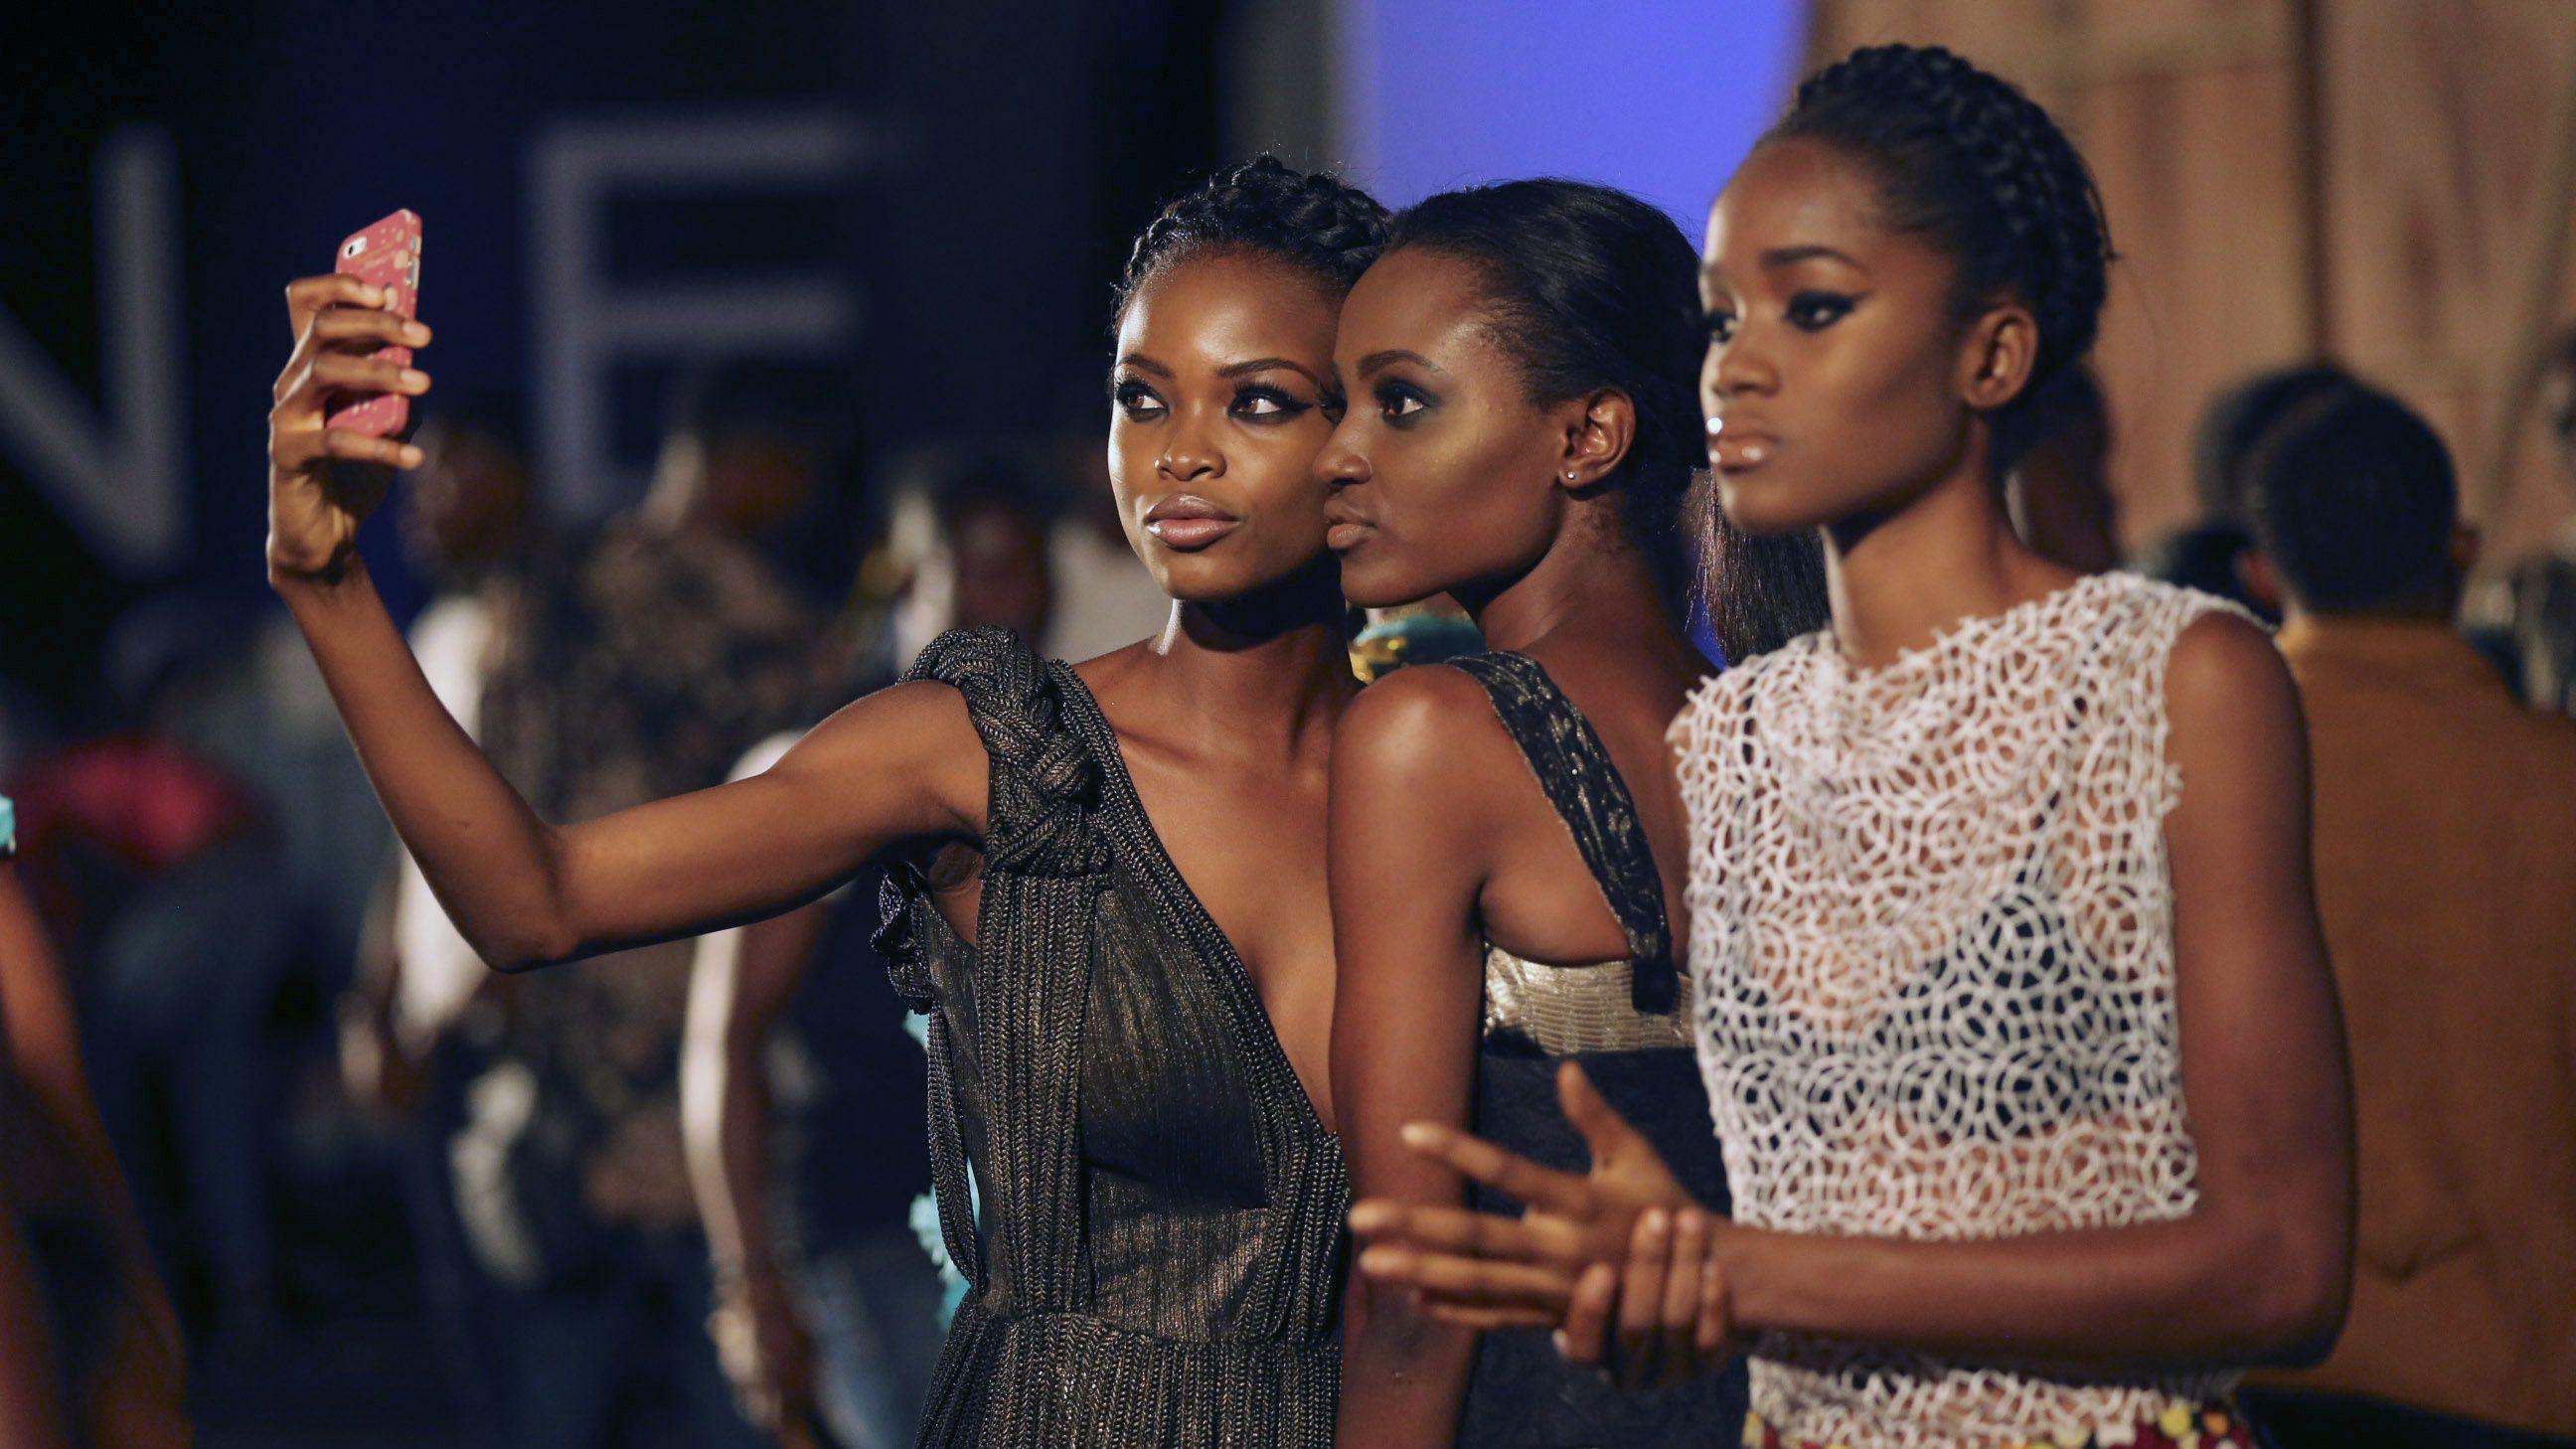 Models take a selfie backstage during Lagos fashion and design week October 29, 2014. Picture taken October 29, 2014.